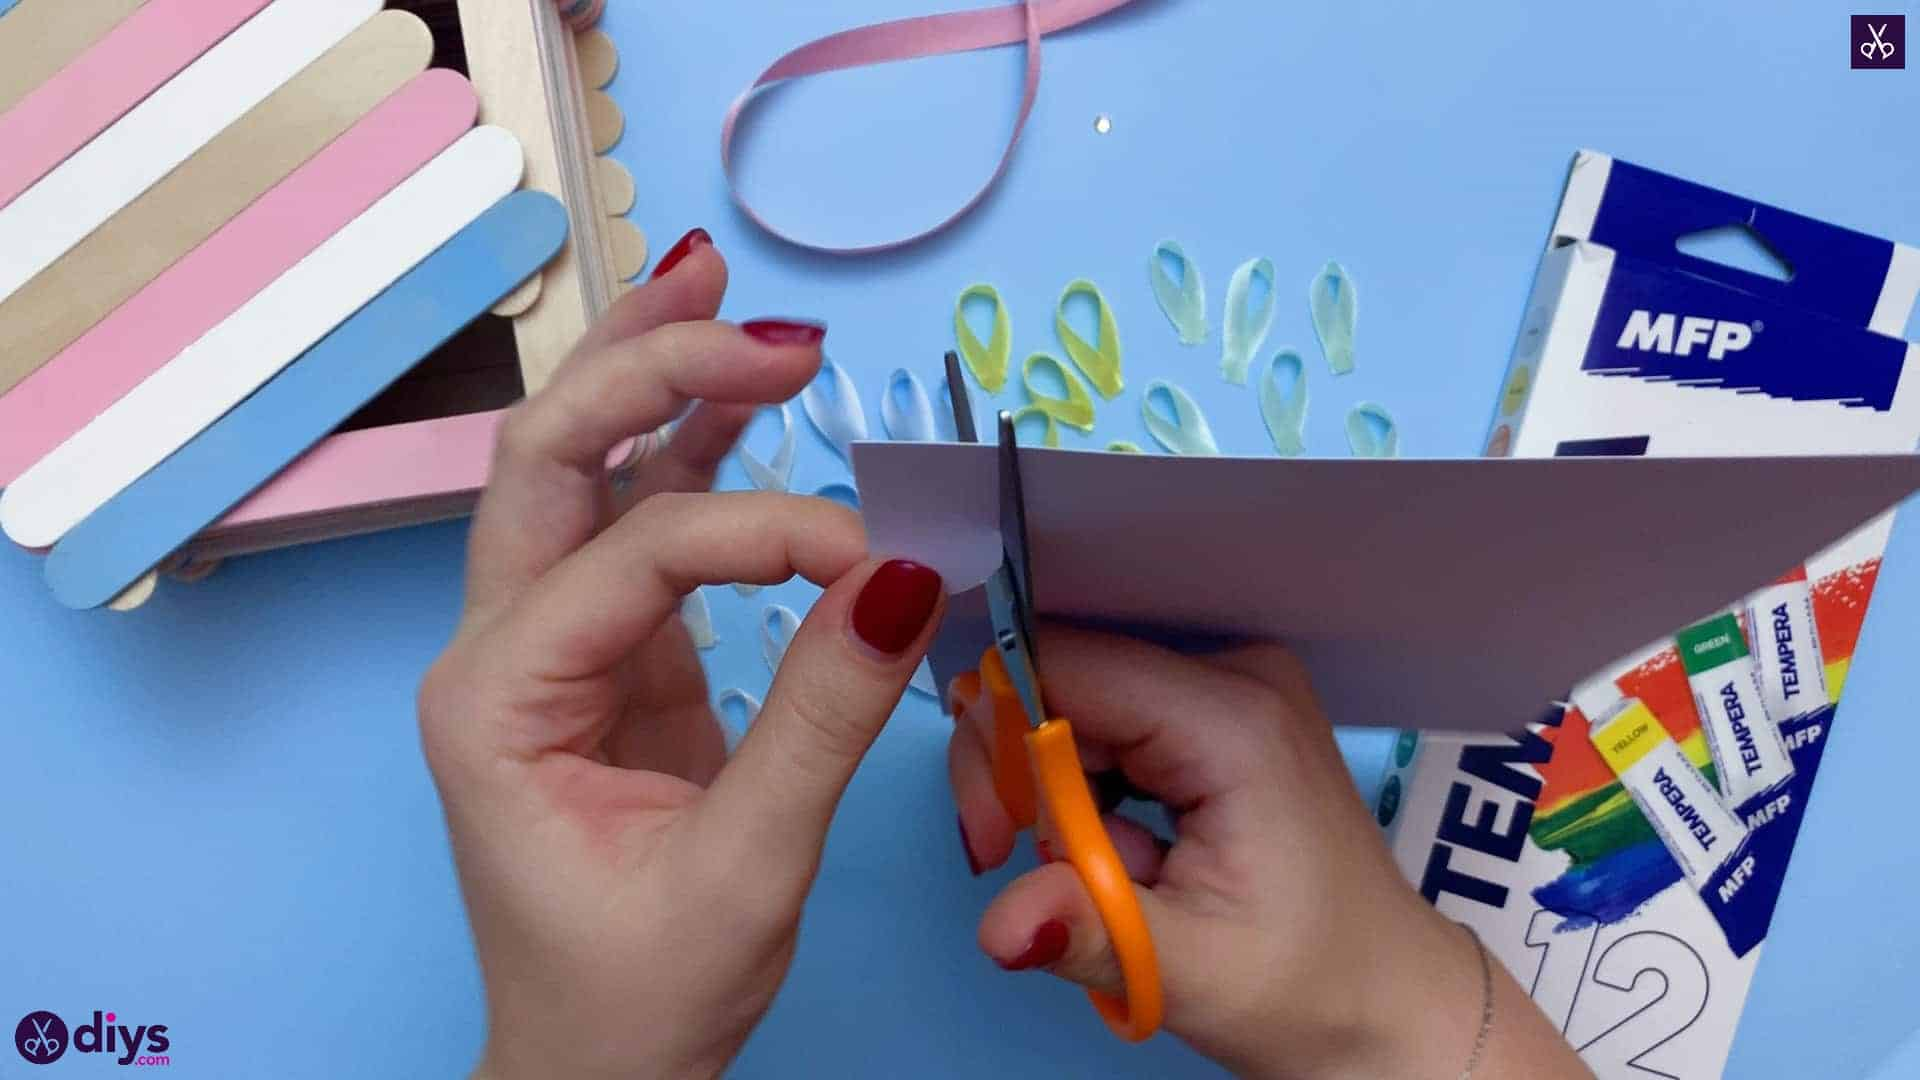 Diy popsicle stick jewelry box cardboard